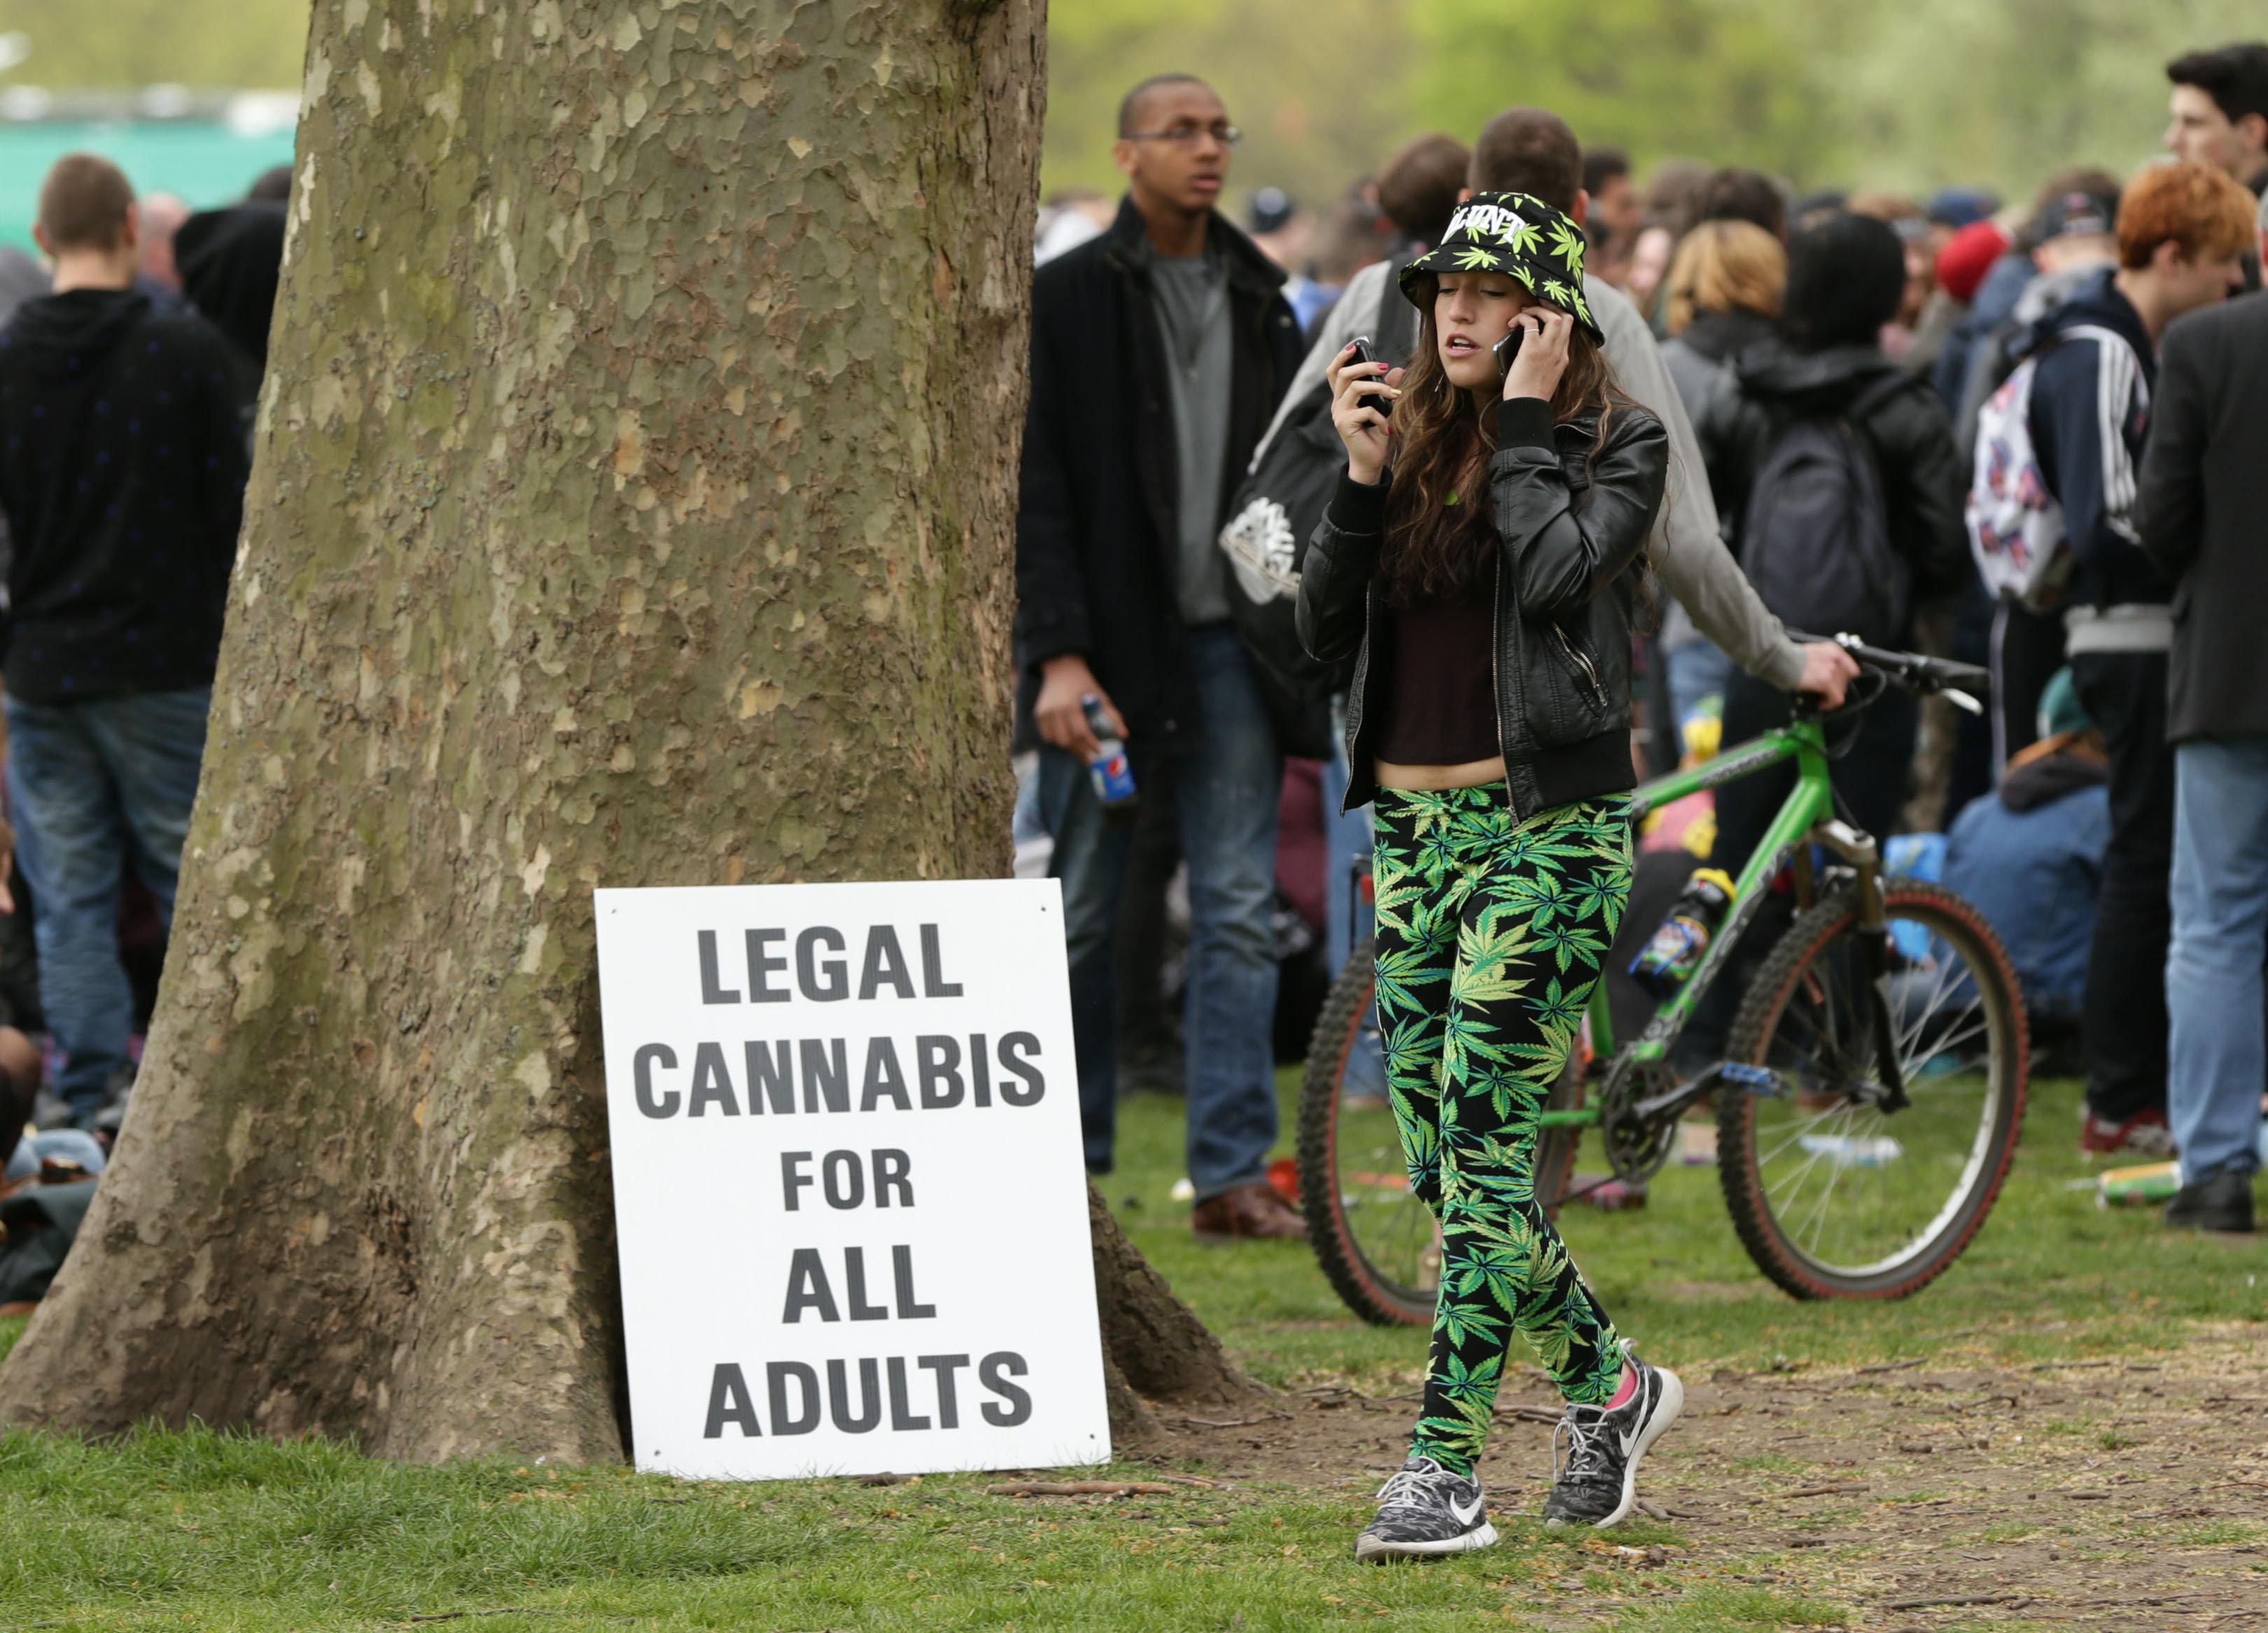 Police Federation Backs Calls For Drugs Reform Saying Current Legislation 'Does Not